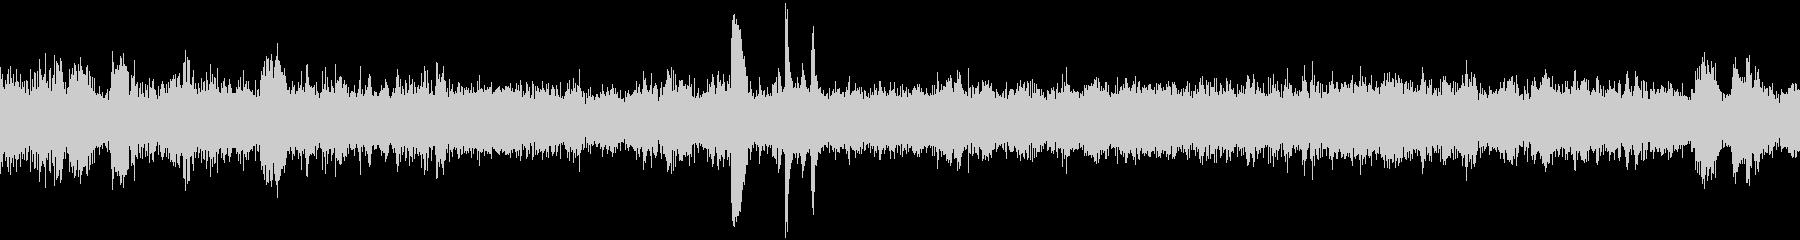 EC、列車の停車音(車内より収録)の未再生の波形